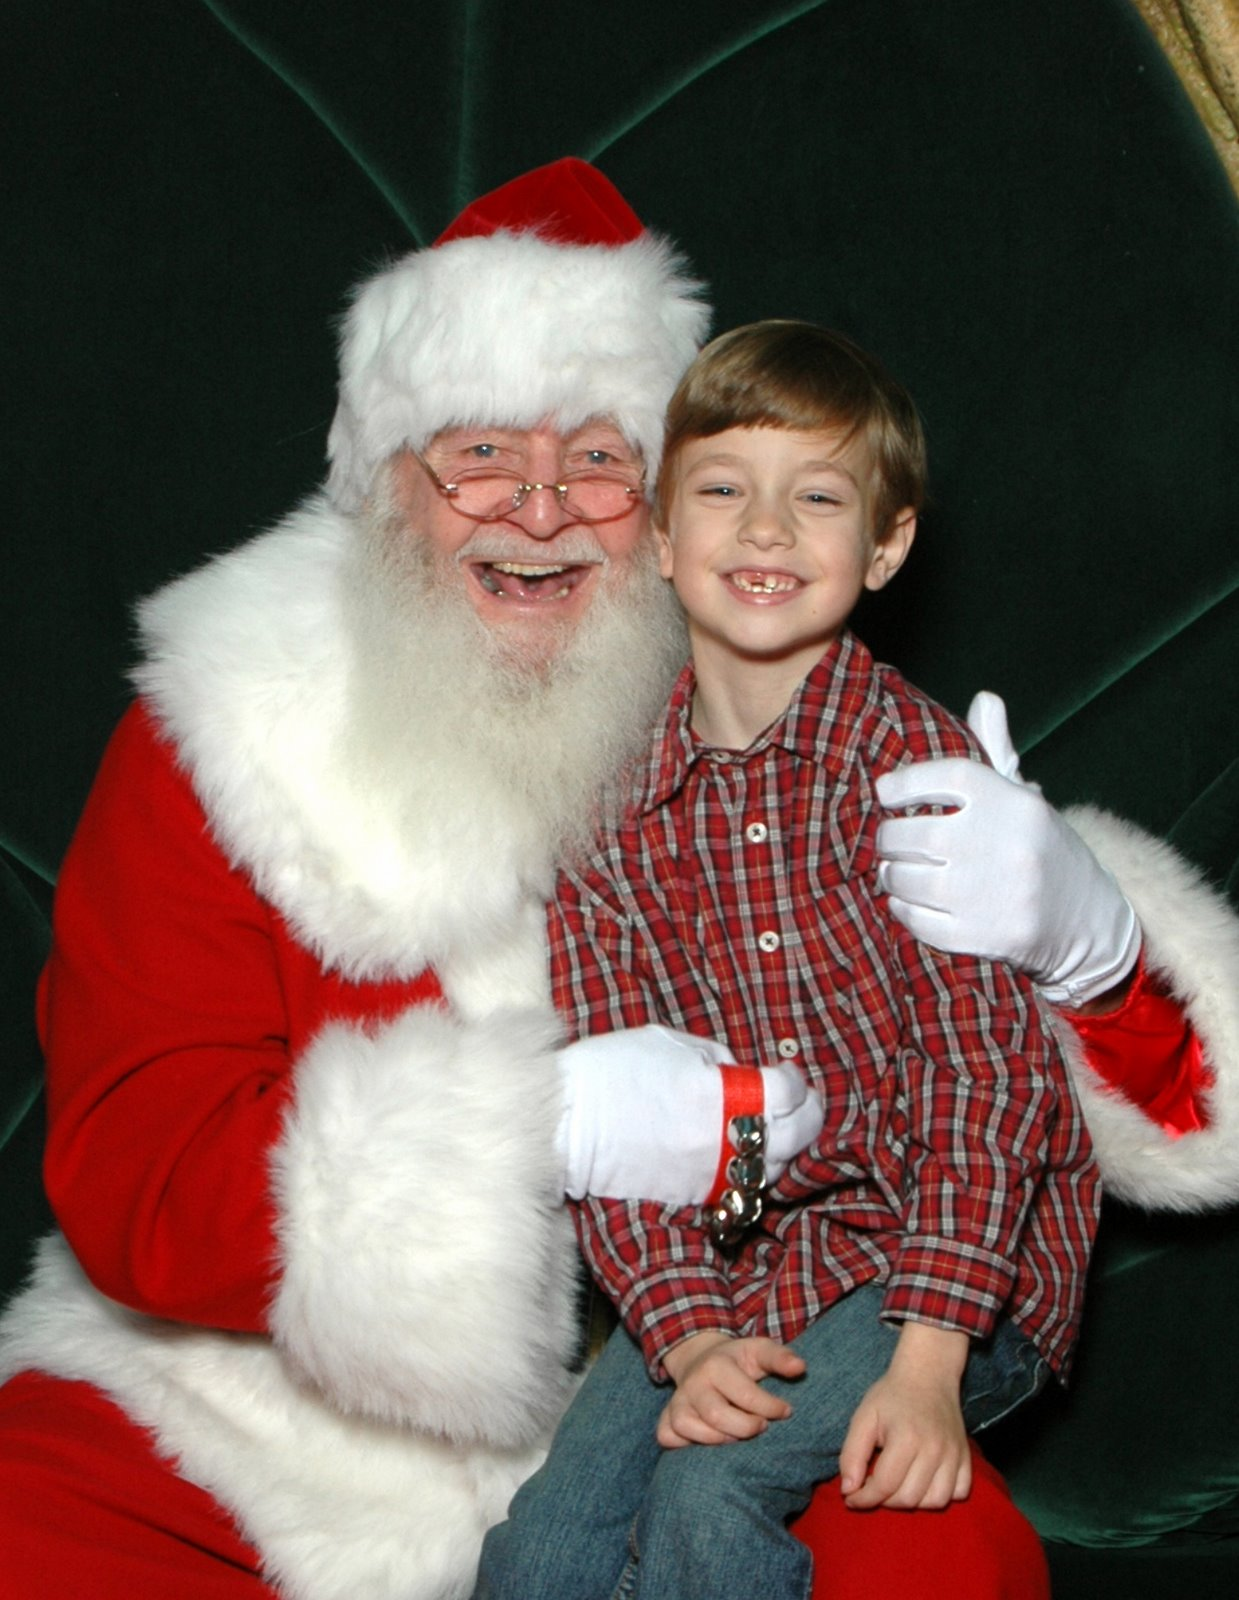 [CRM+w-Santa+2008.12.13.2008]